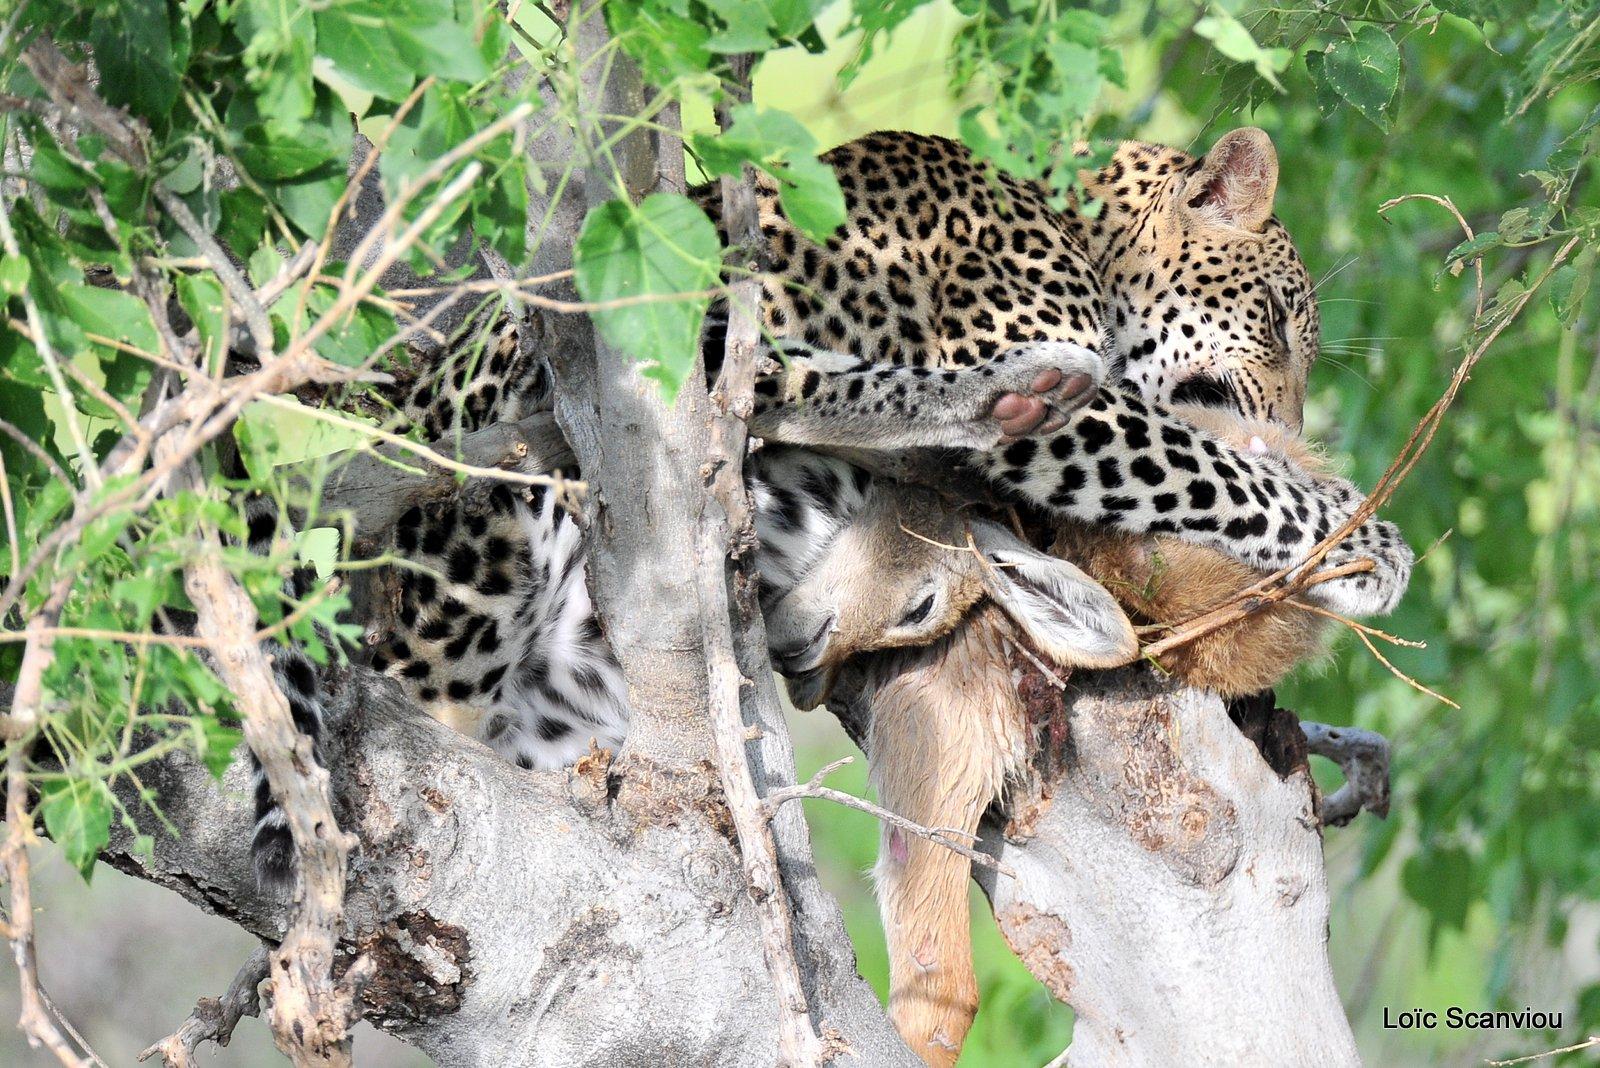 Léopard qui mange/Leopard eating (2)